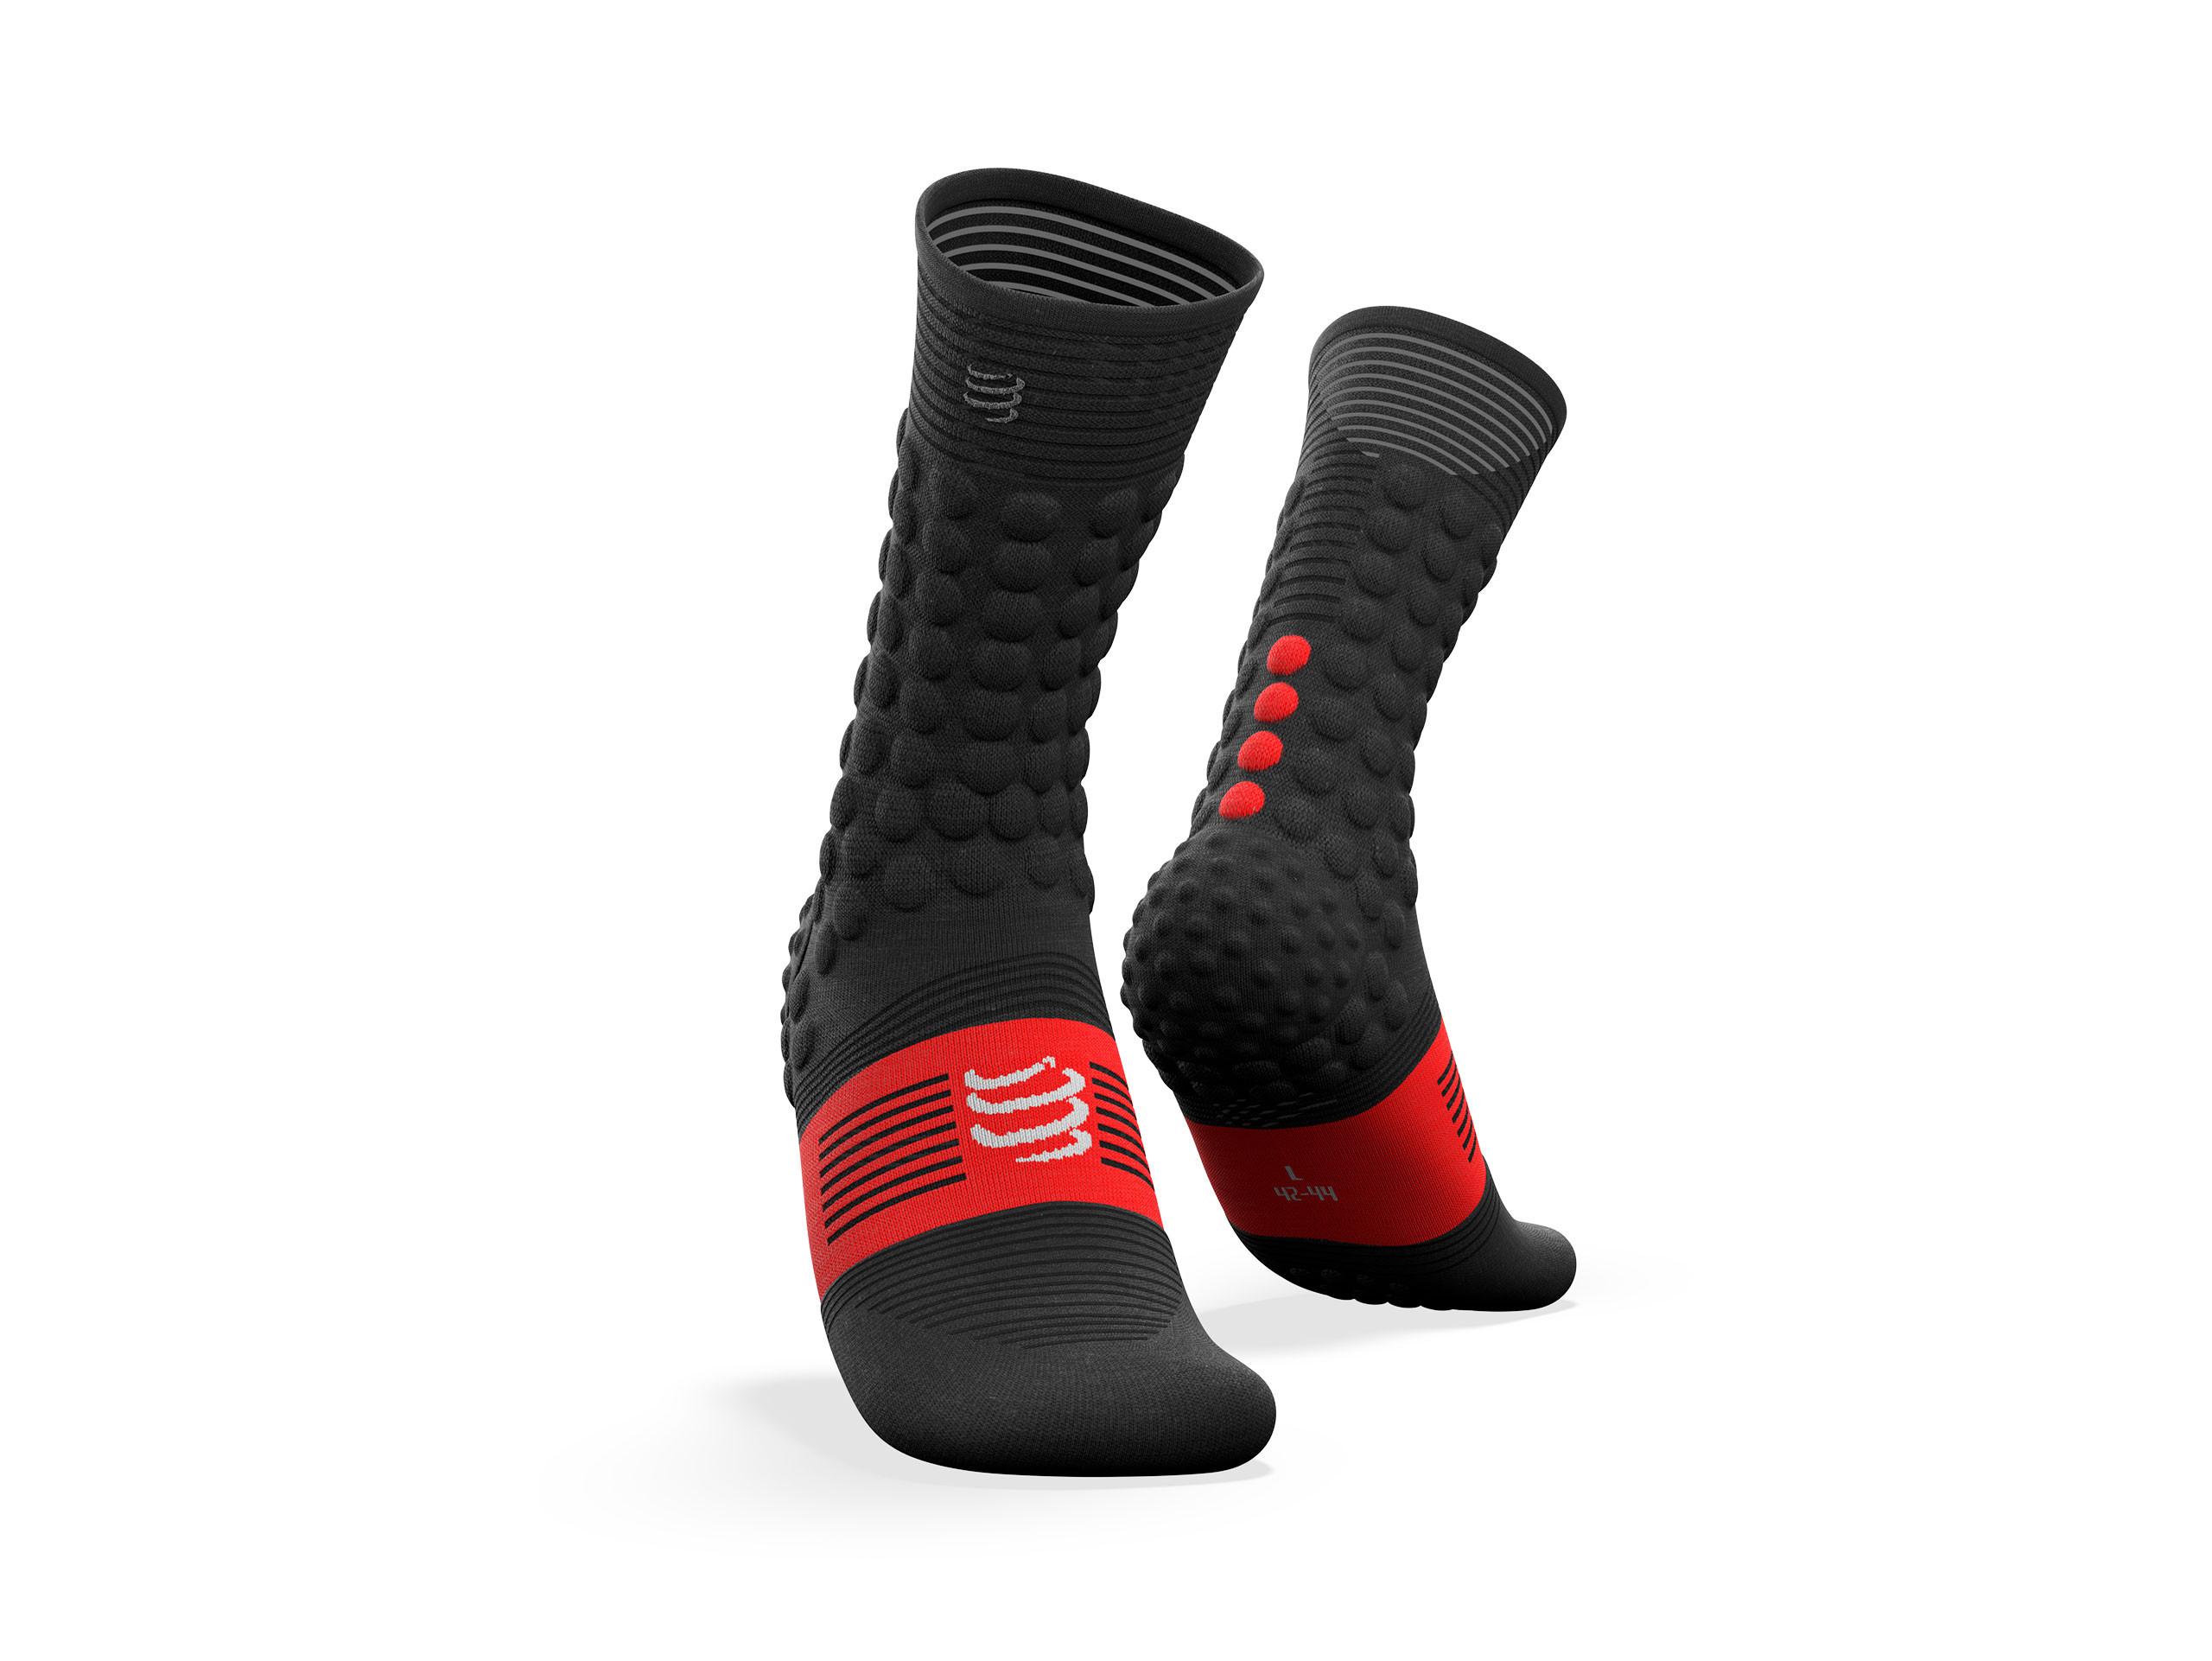 Calcetines deportivos pro v3.0 - Winter bike negros